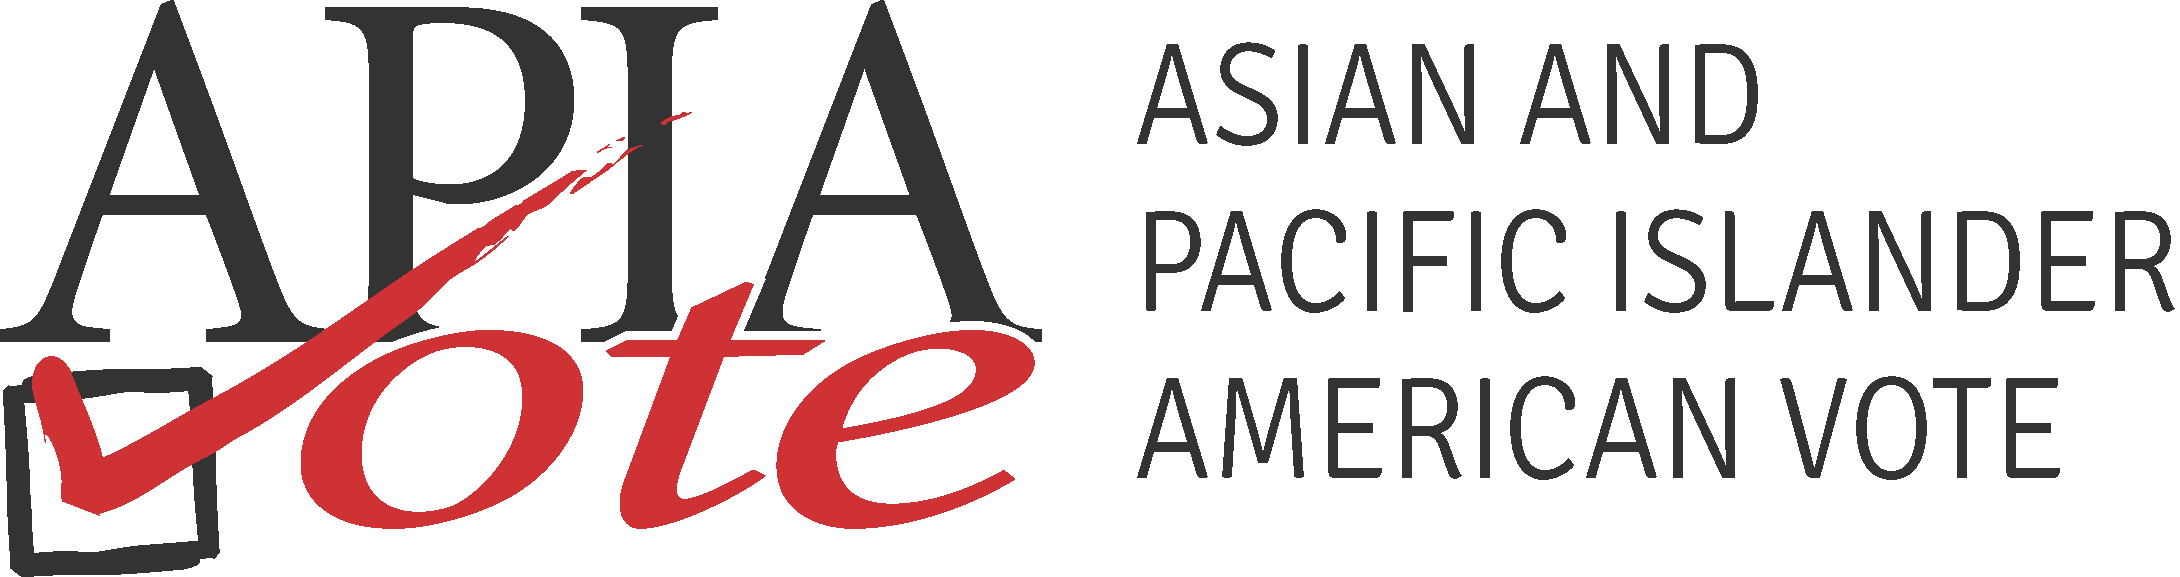 APIAVote logo